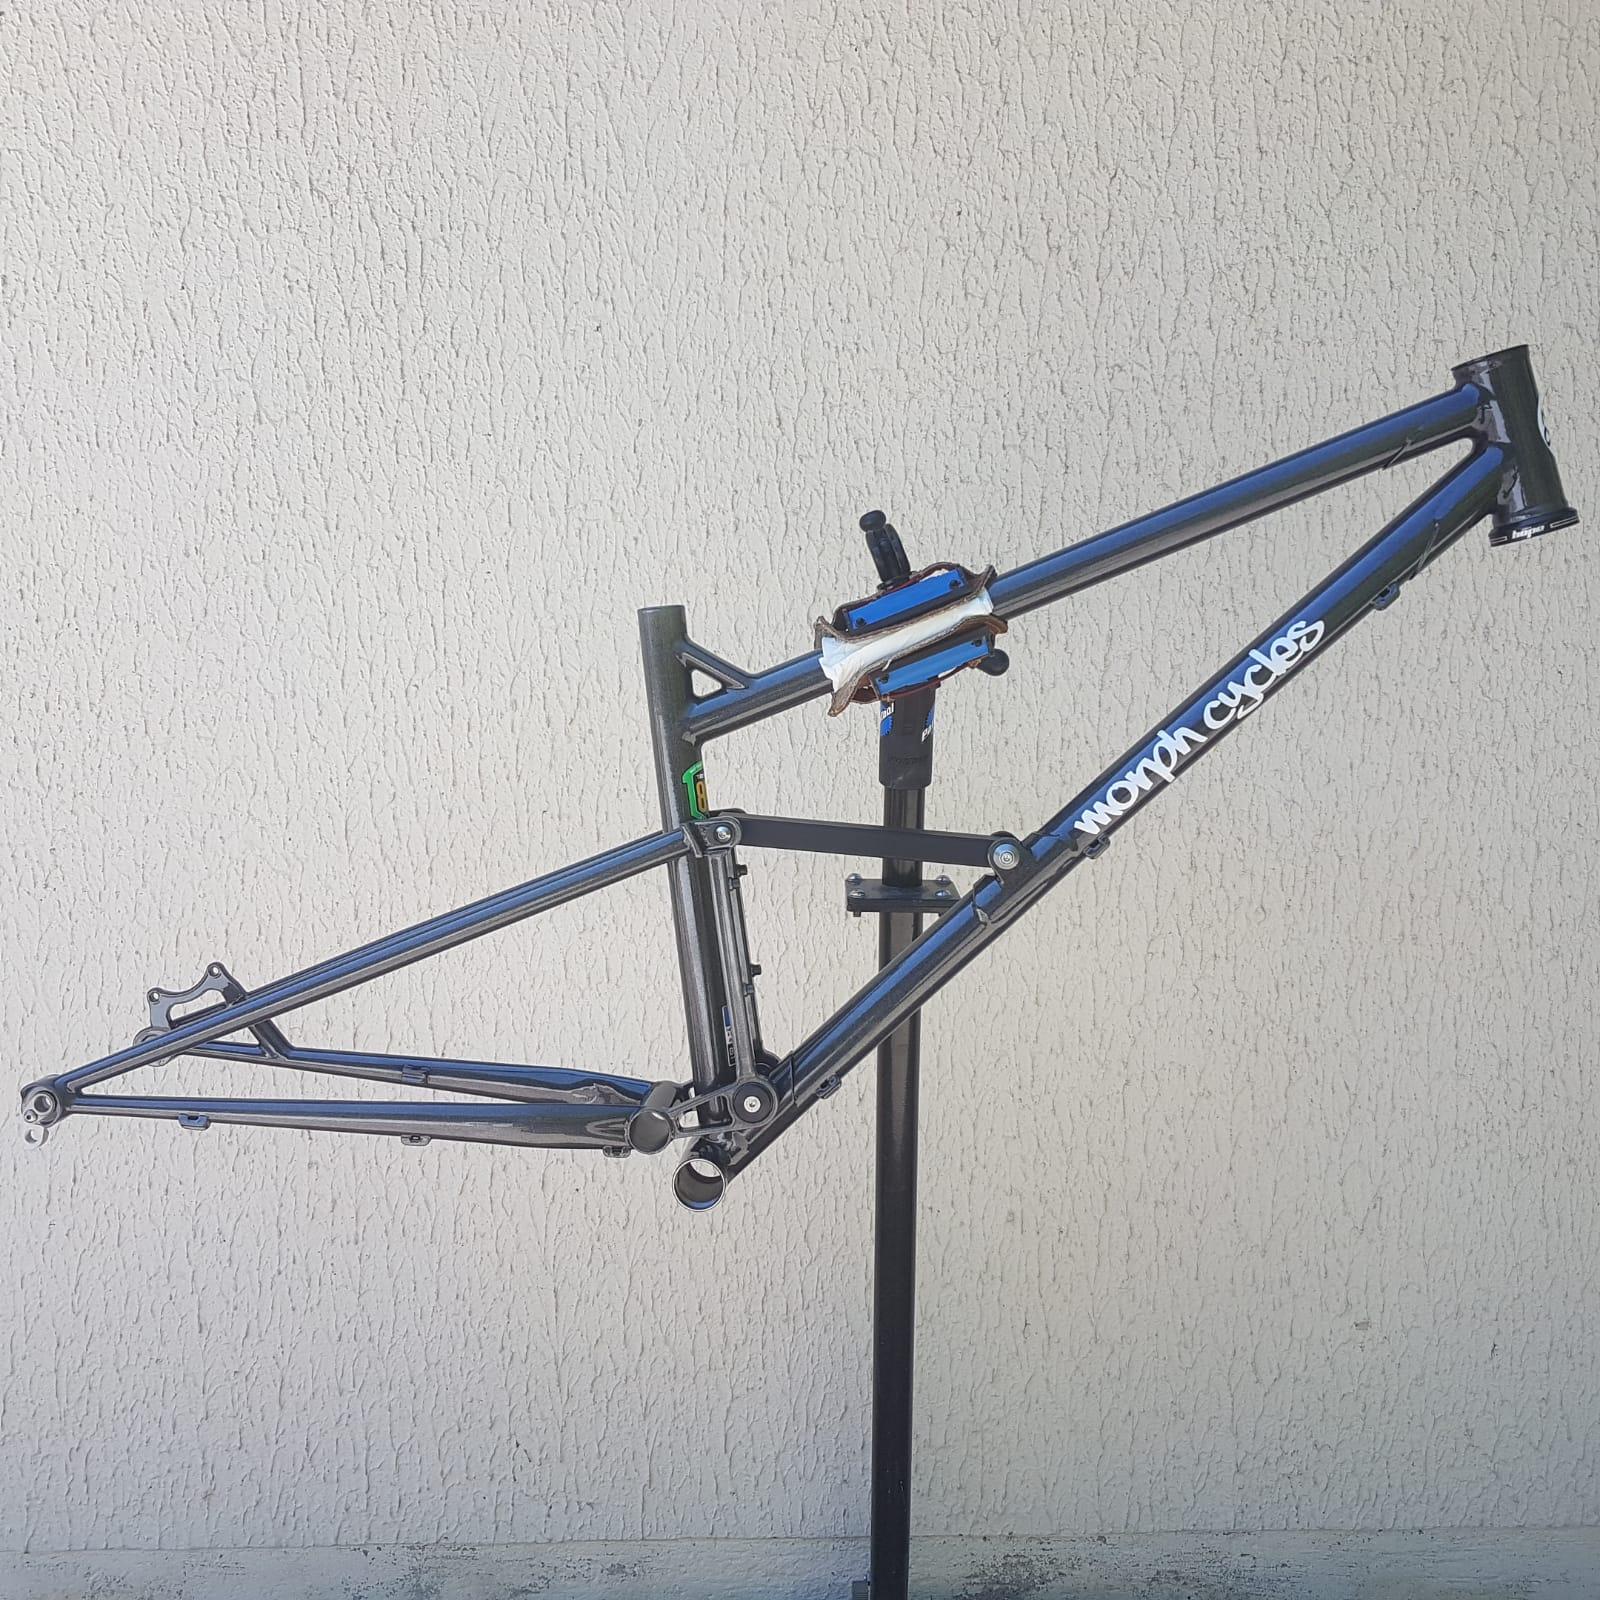 Baudou_bikes_tout_suspendu_cote_fini